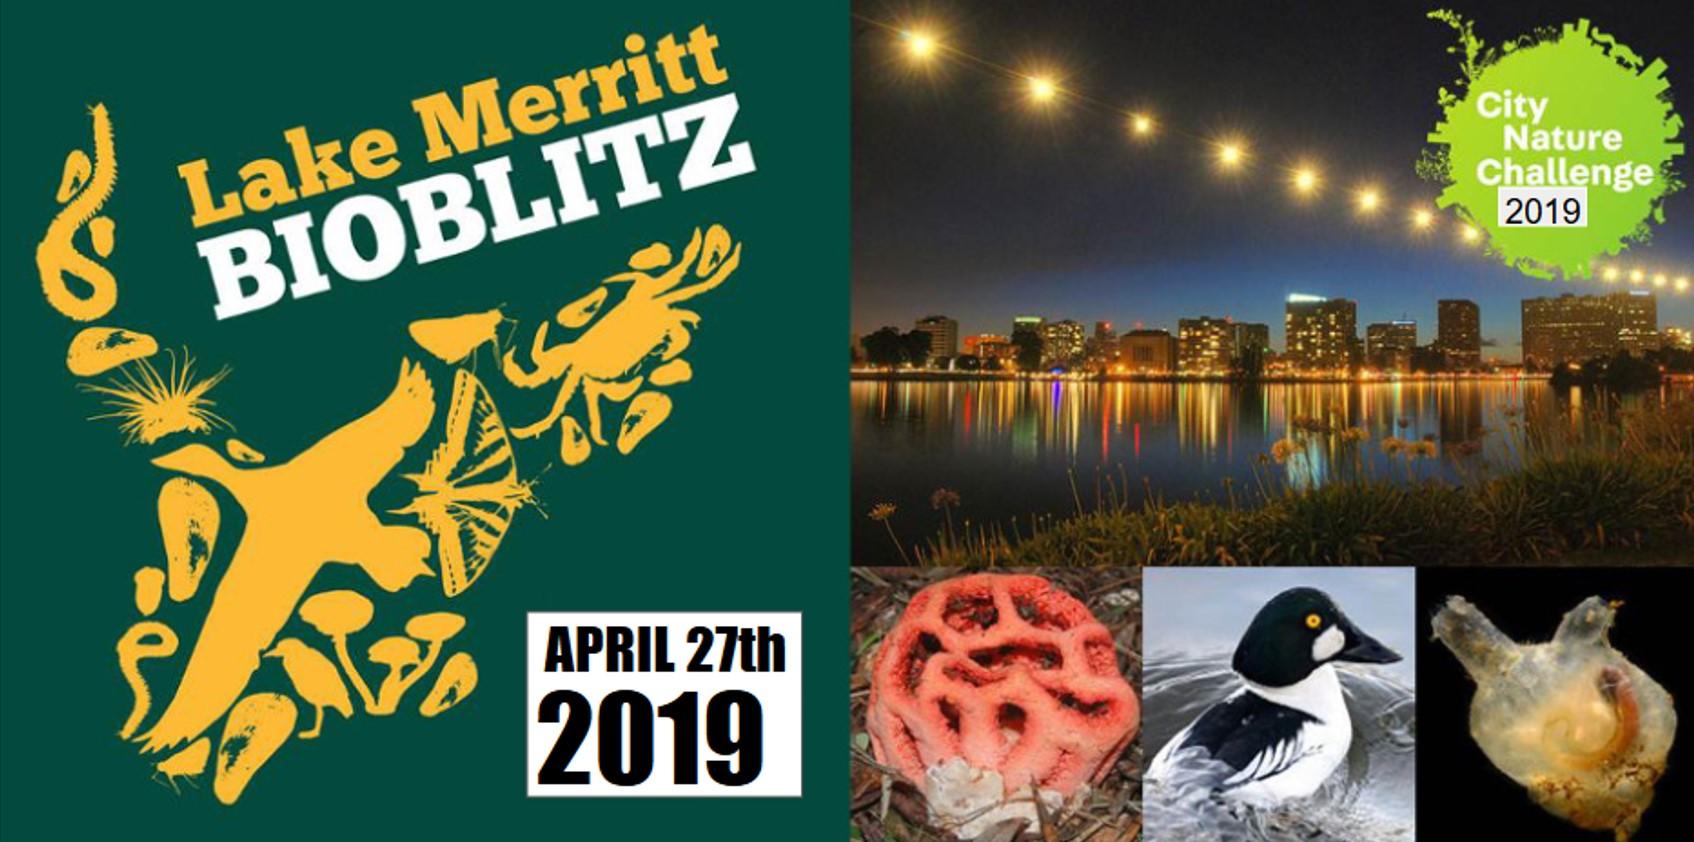 2019 LM bioblitz banner.jpg